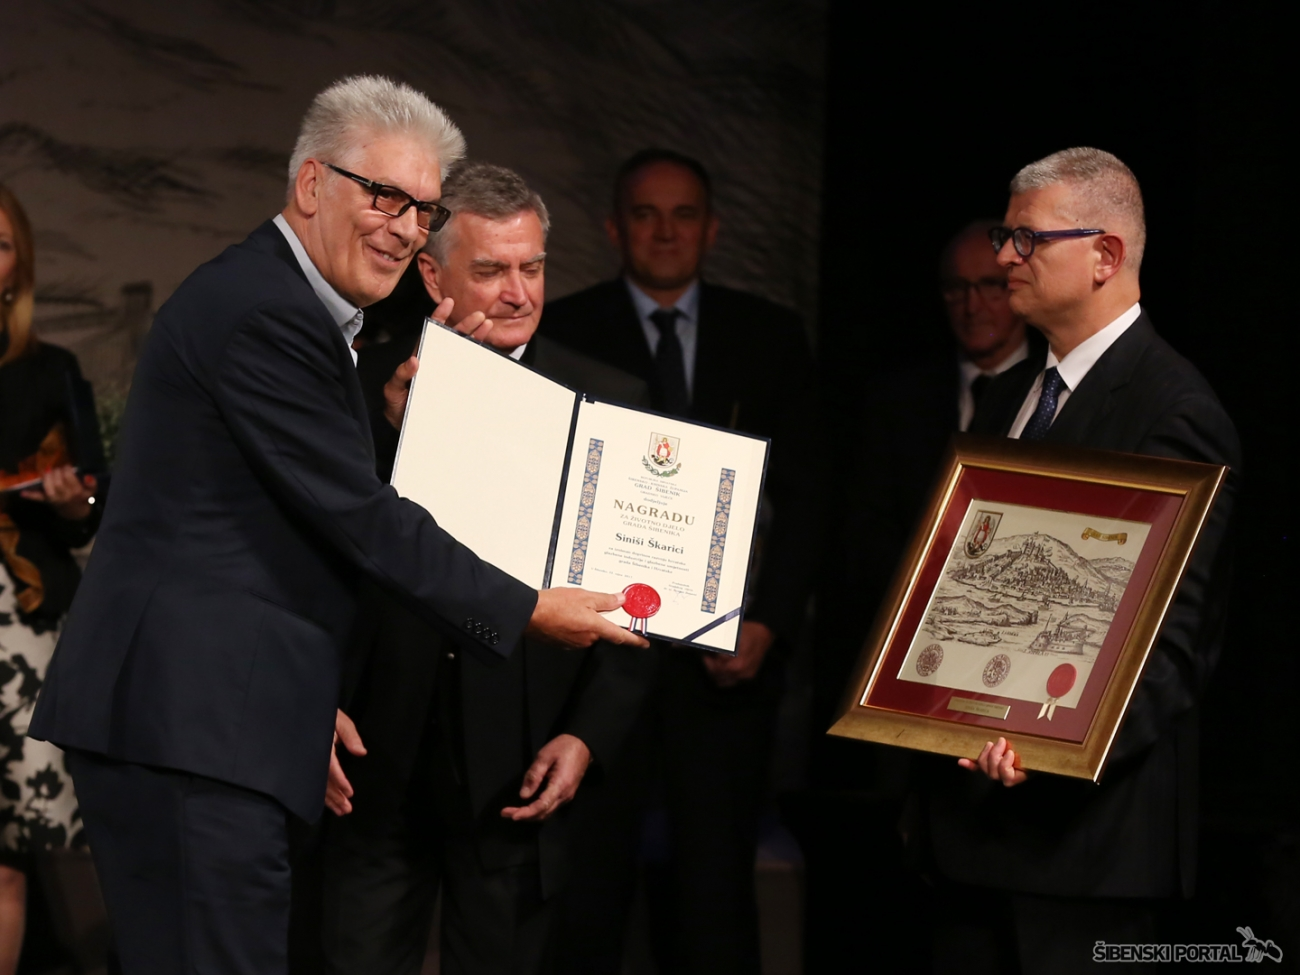 nagrada grada sibenika 280917 14